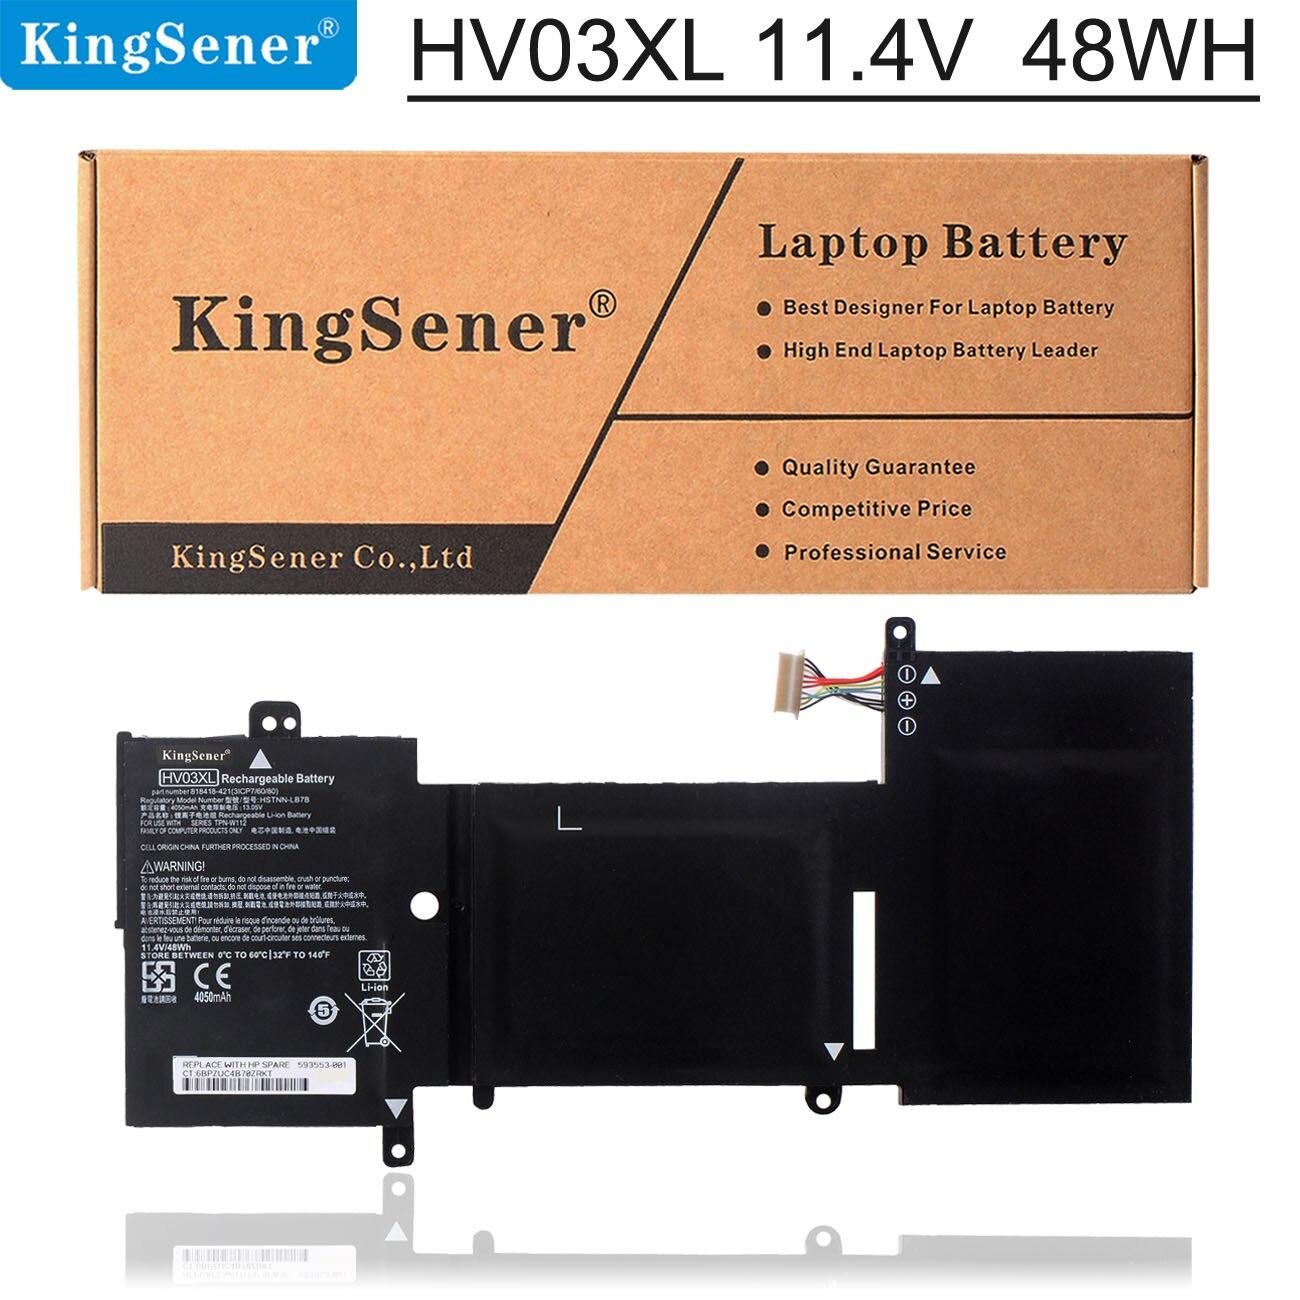 KingSener HV03XL محمول بطارية لجهاز HP X360 310 G2 HSTNN-LB7B TPN-W112 818418-421 817184-005 11.4V 48WH